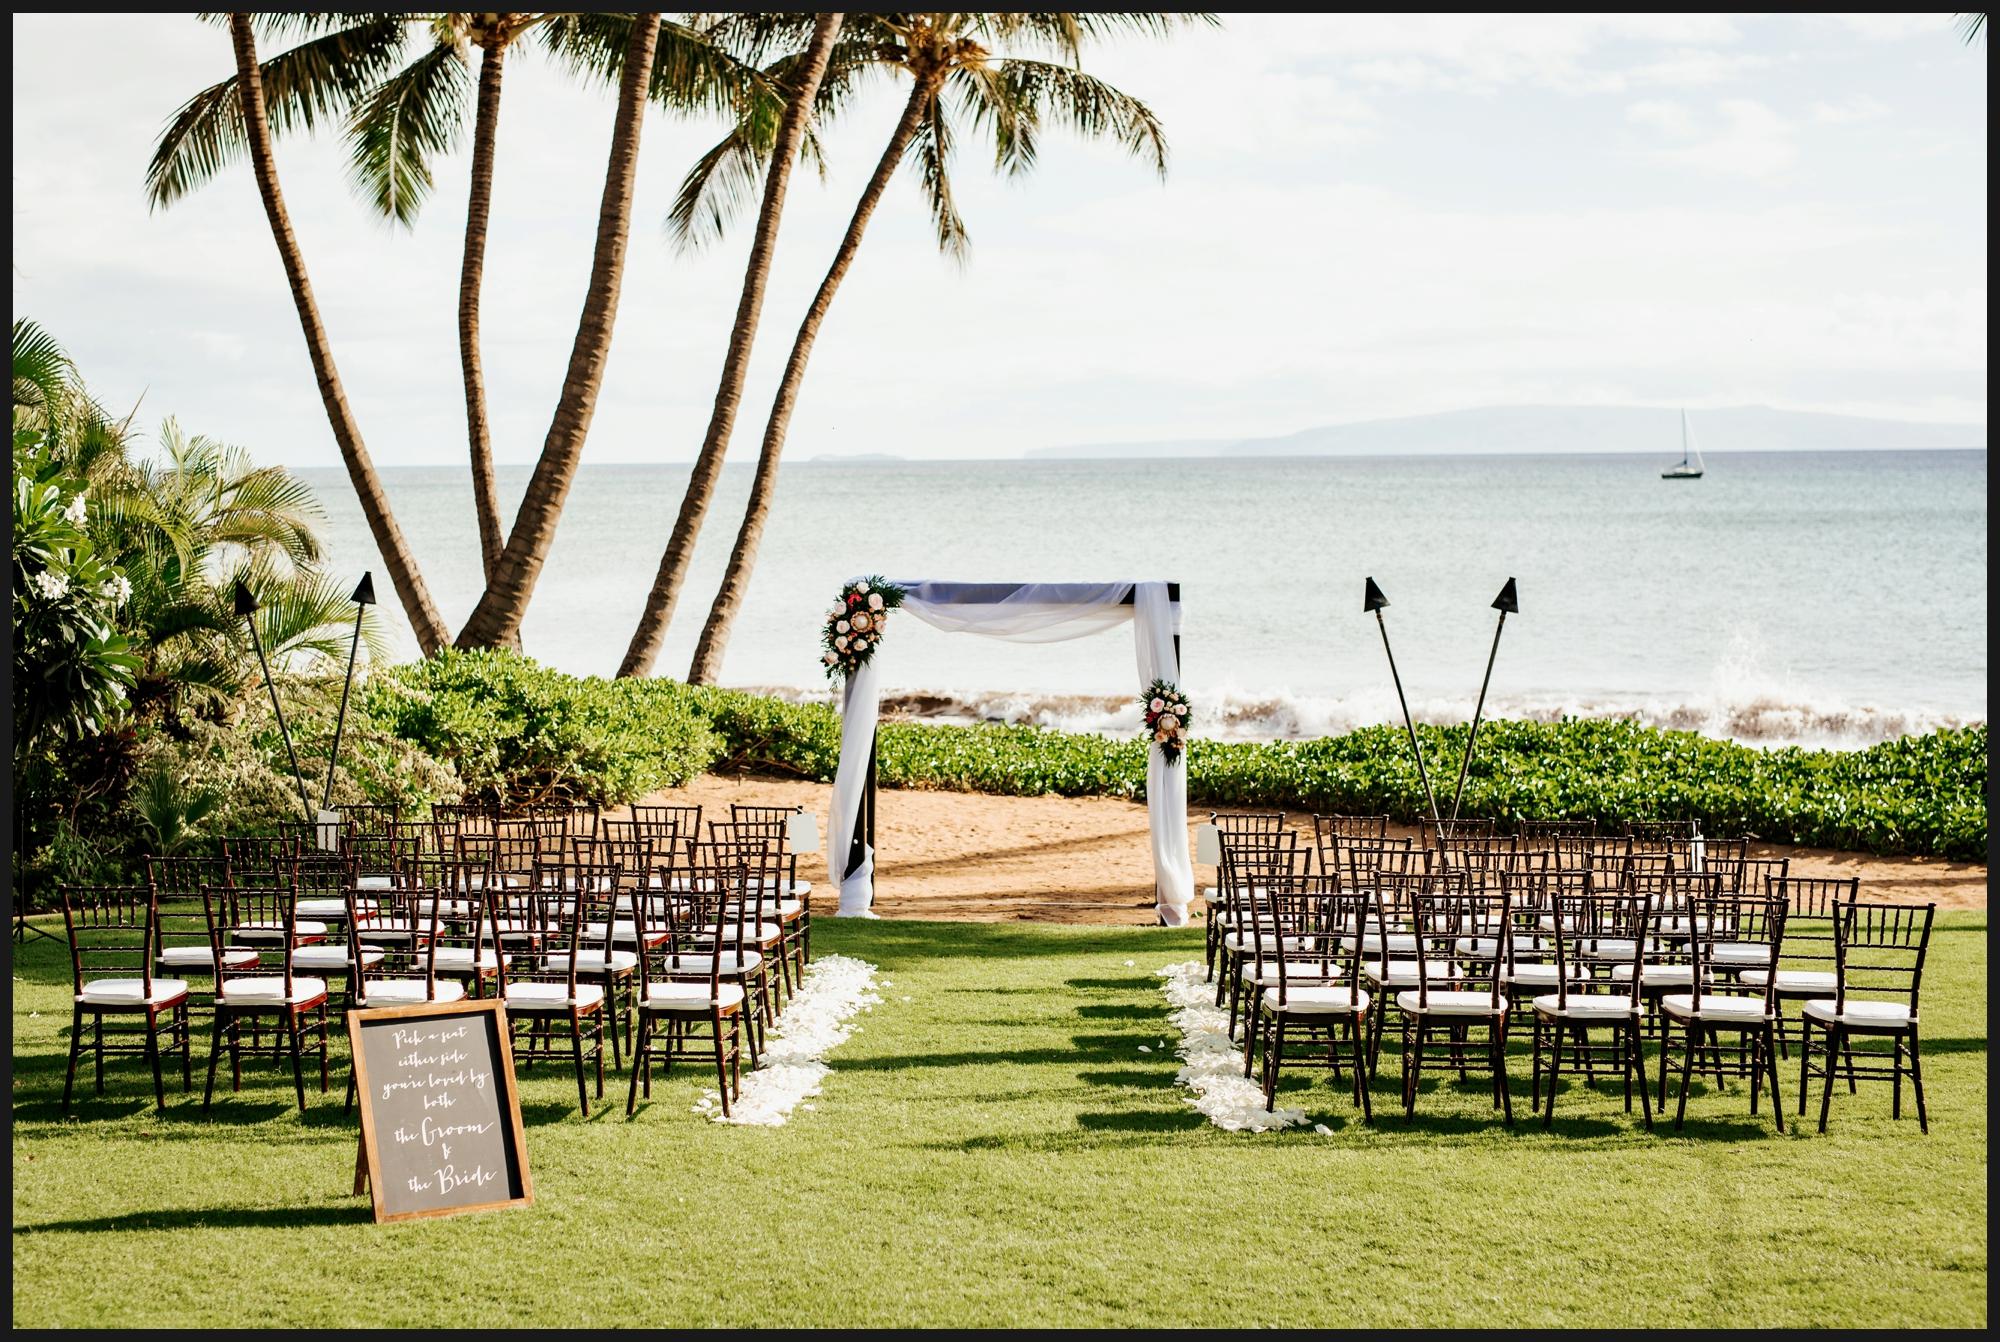 Orlando-Wedding-Photographer-destination-wedding-photographer-florida-wedding-photographer-hawaii-wedding-photographer_0049.jpg